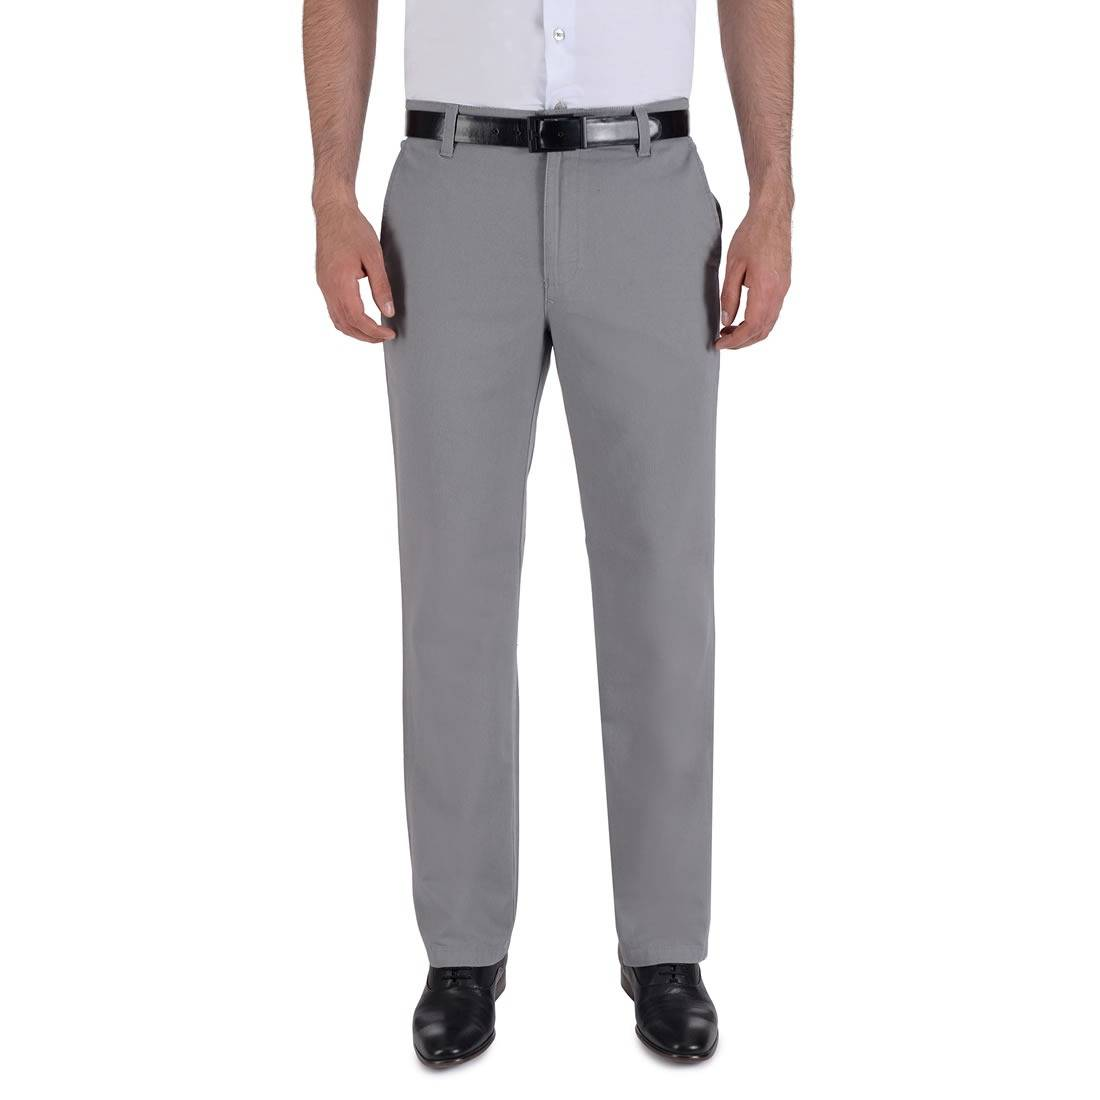 010811074406-01-Pantalon-Casual-Sin-Pinzas-Classic-Fit-Gris-yale